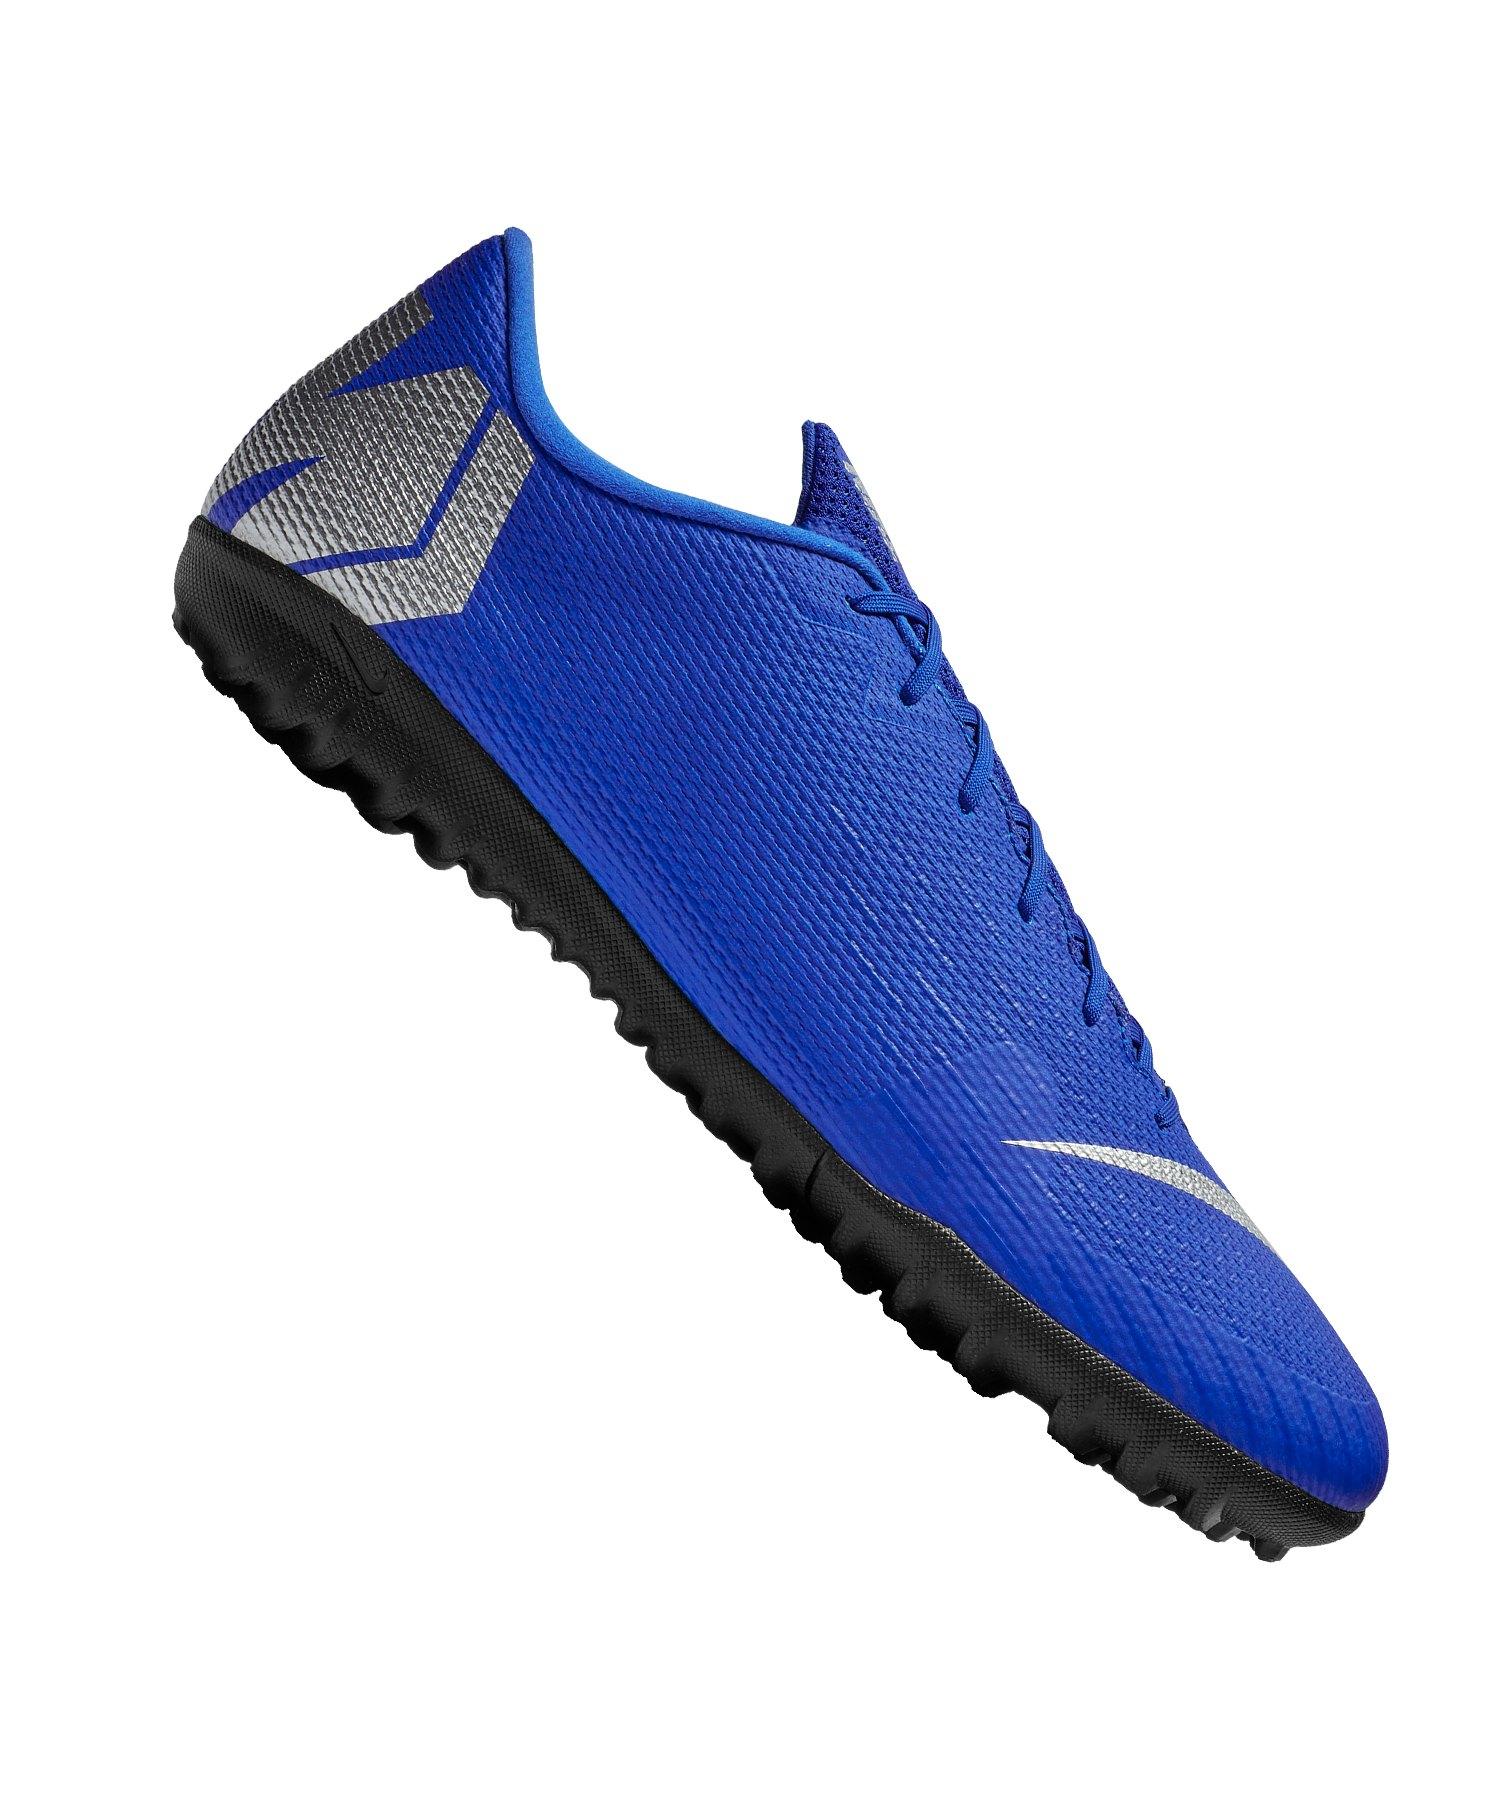 super popular 48624 192e8 Nike Mercurial VaporX XII Academy TF Blau F400 | Cleets | Fußballschuh